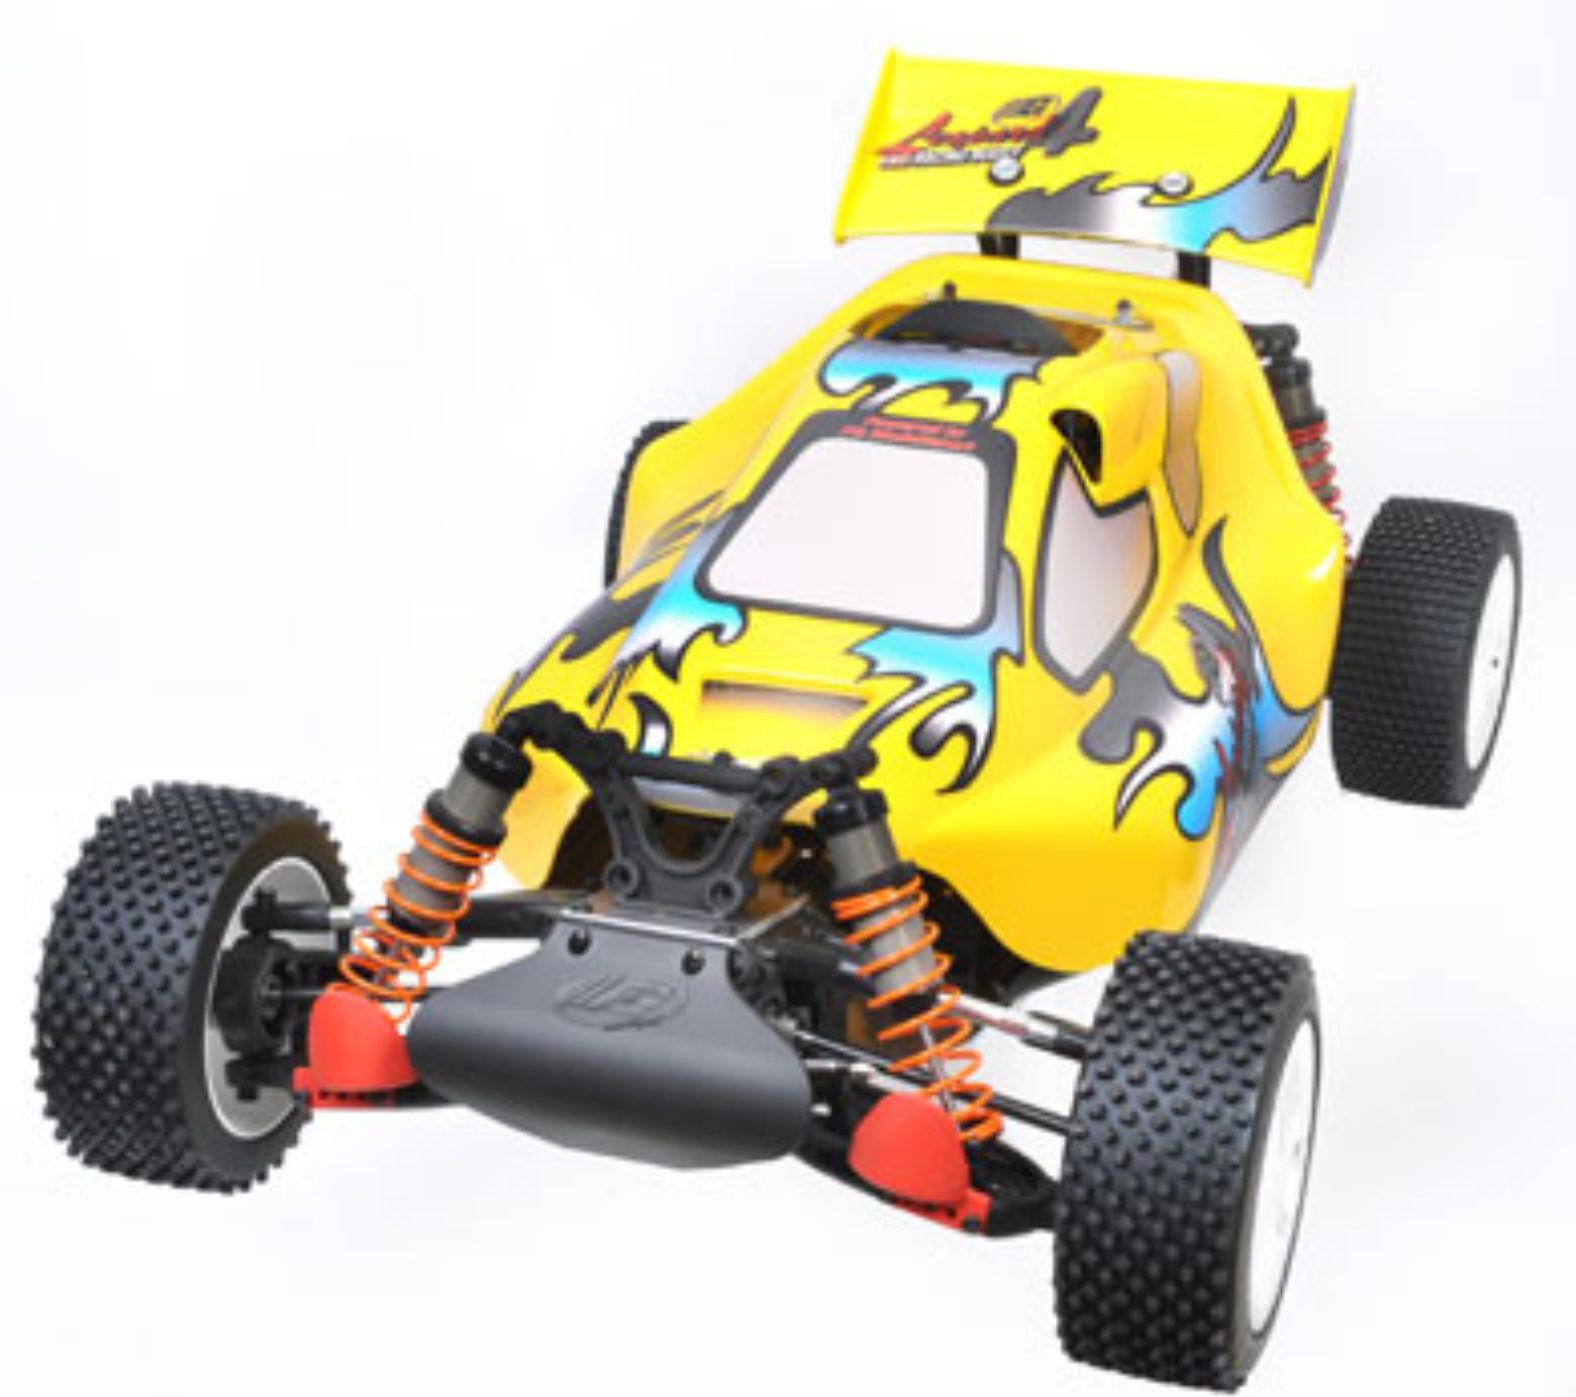 FG modellsport r LEOPARDO 4 Sportsline sin lacar RTR con mando a distancia